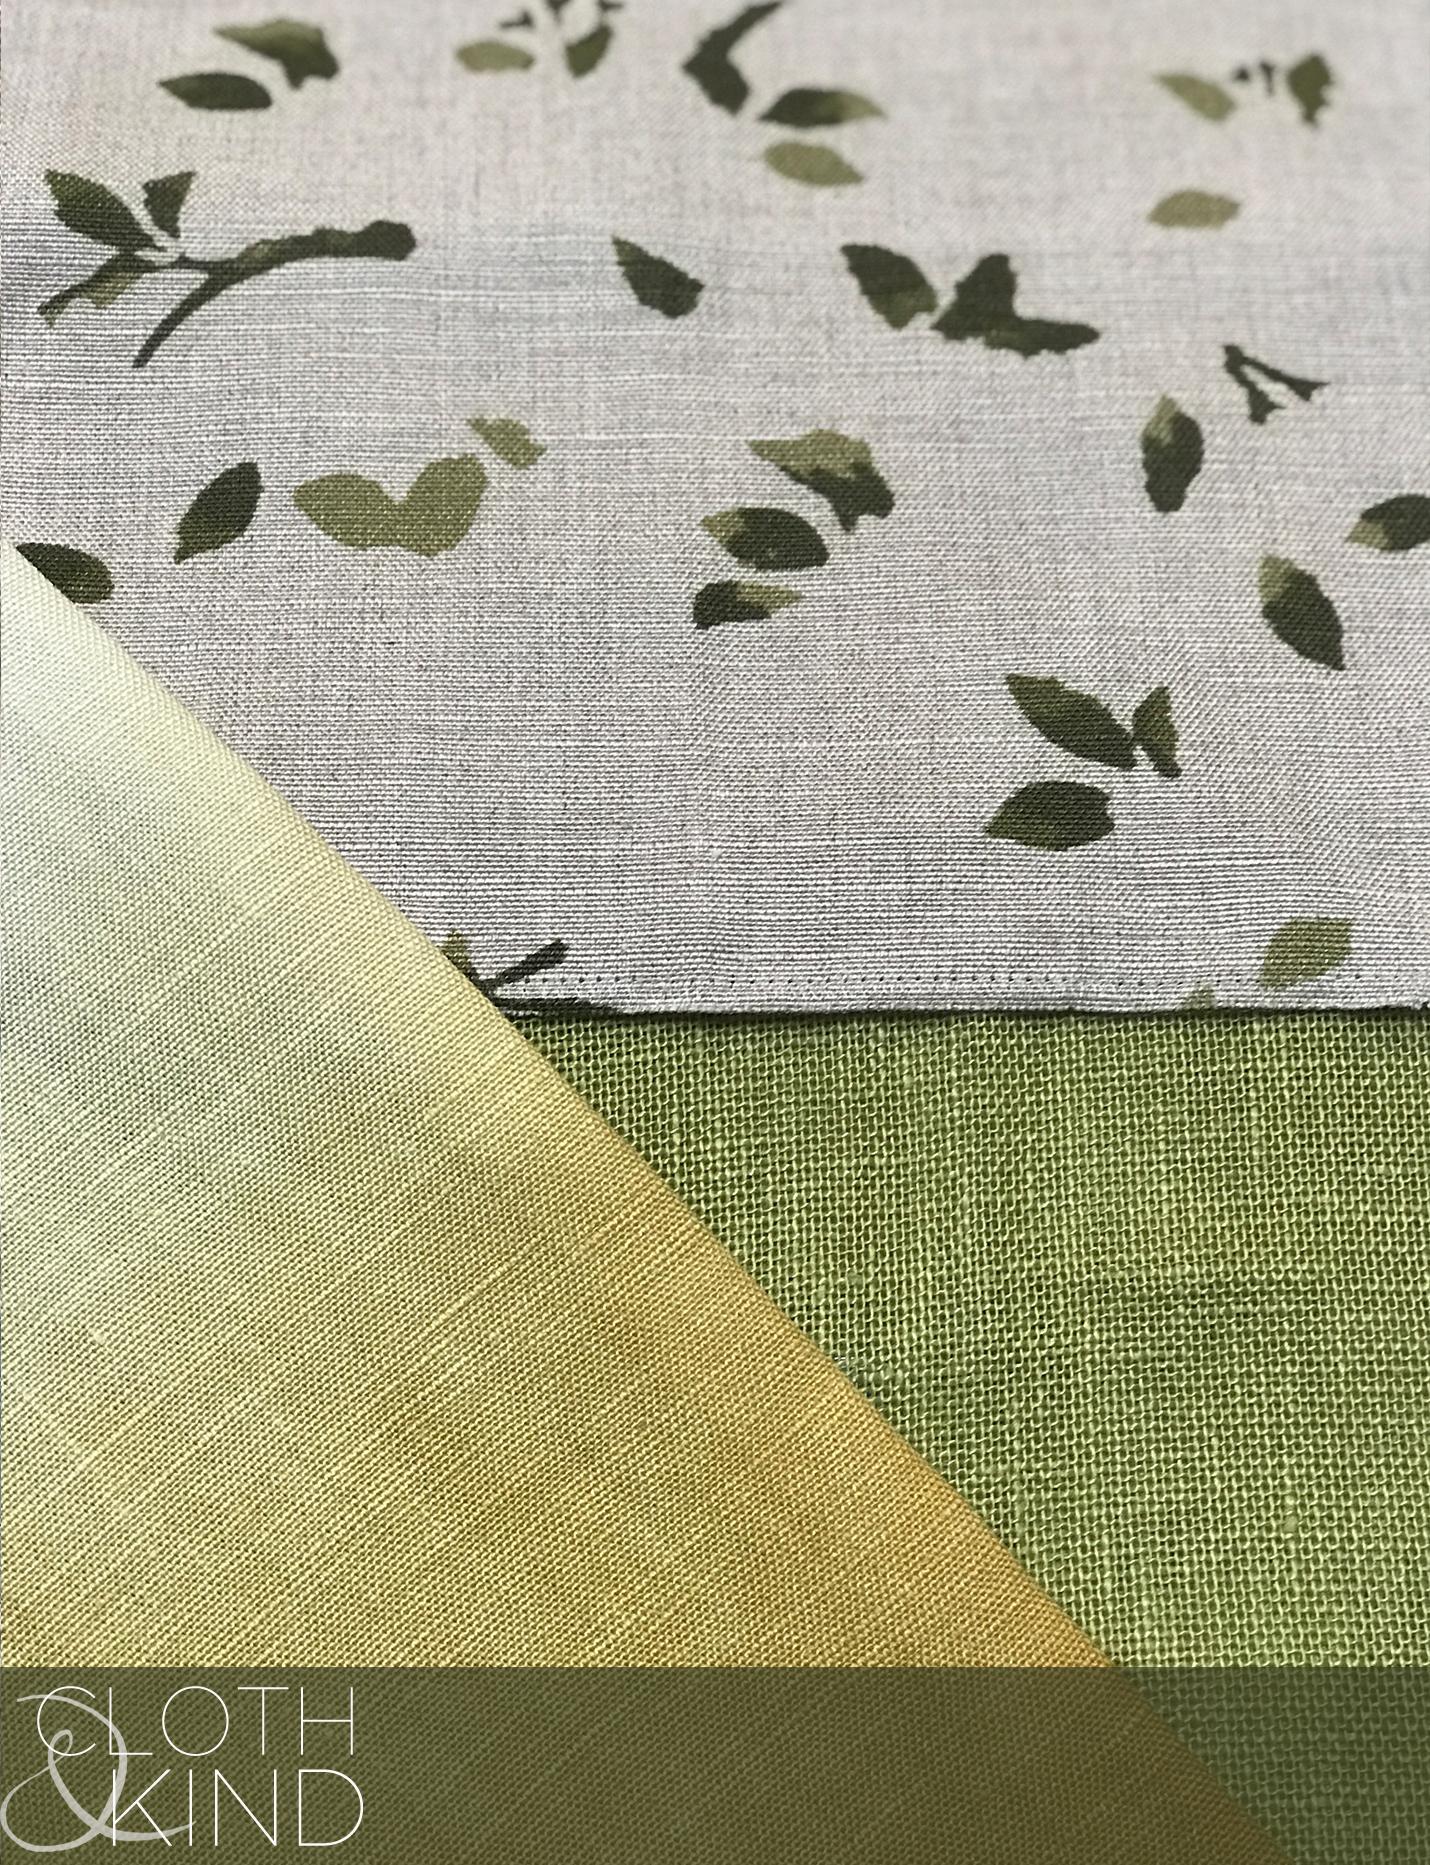 CLOTH & KIND // Palette, No. 59